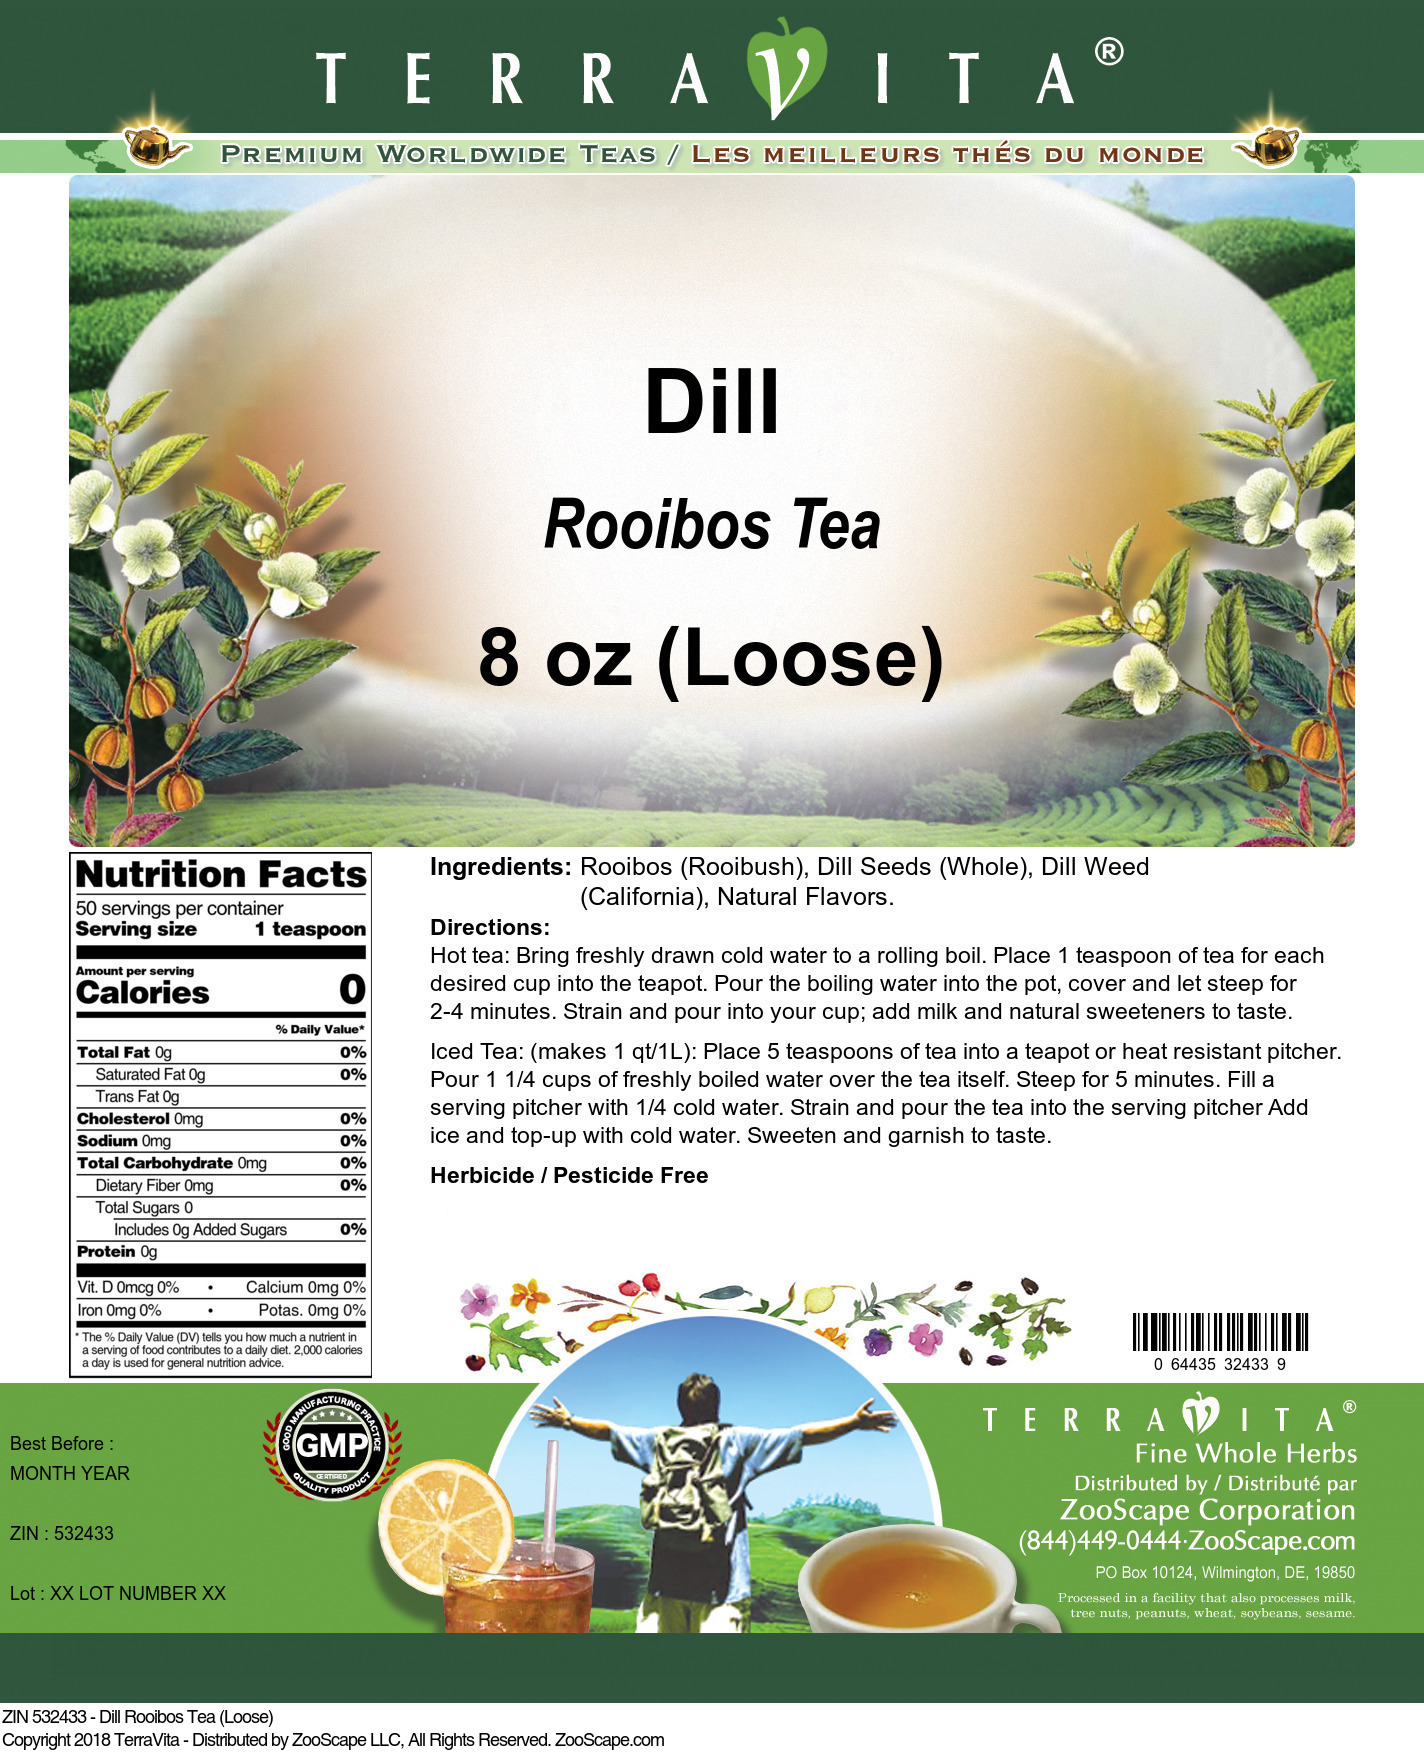 Dill Rooibos Tea (Loose)